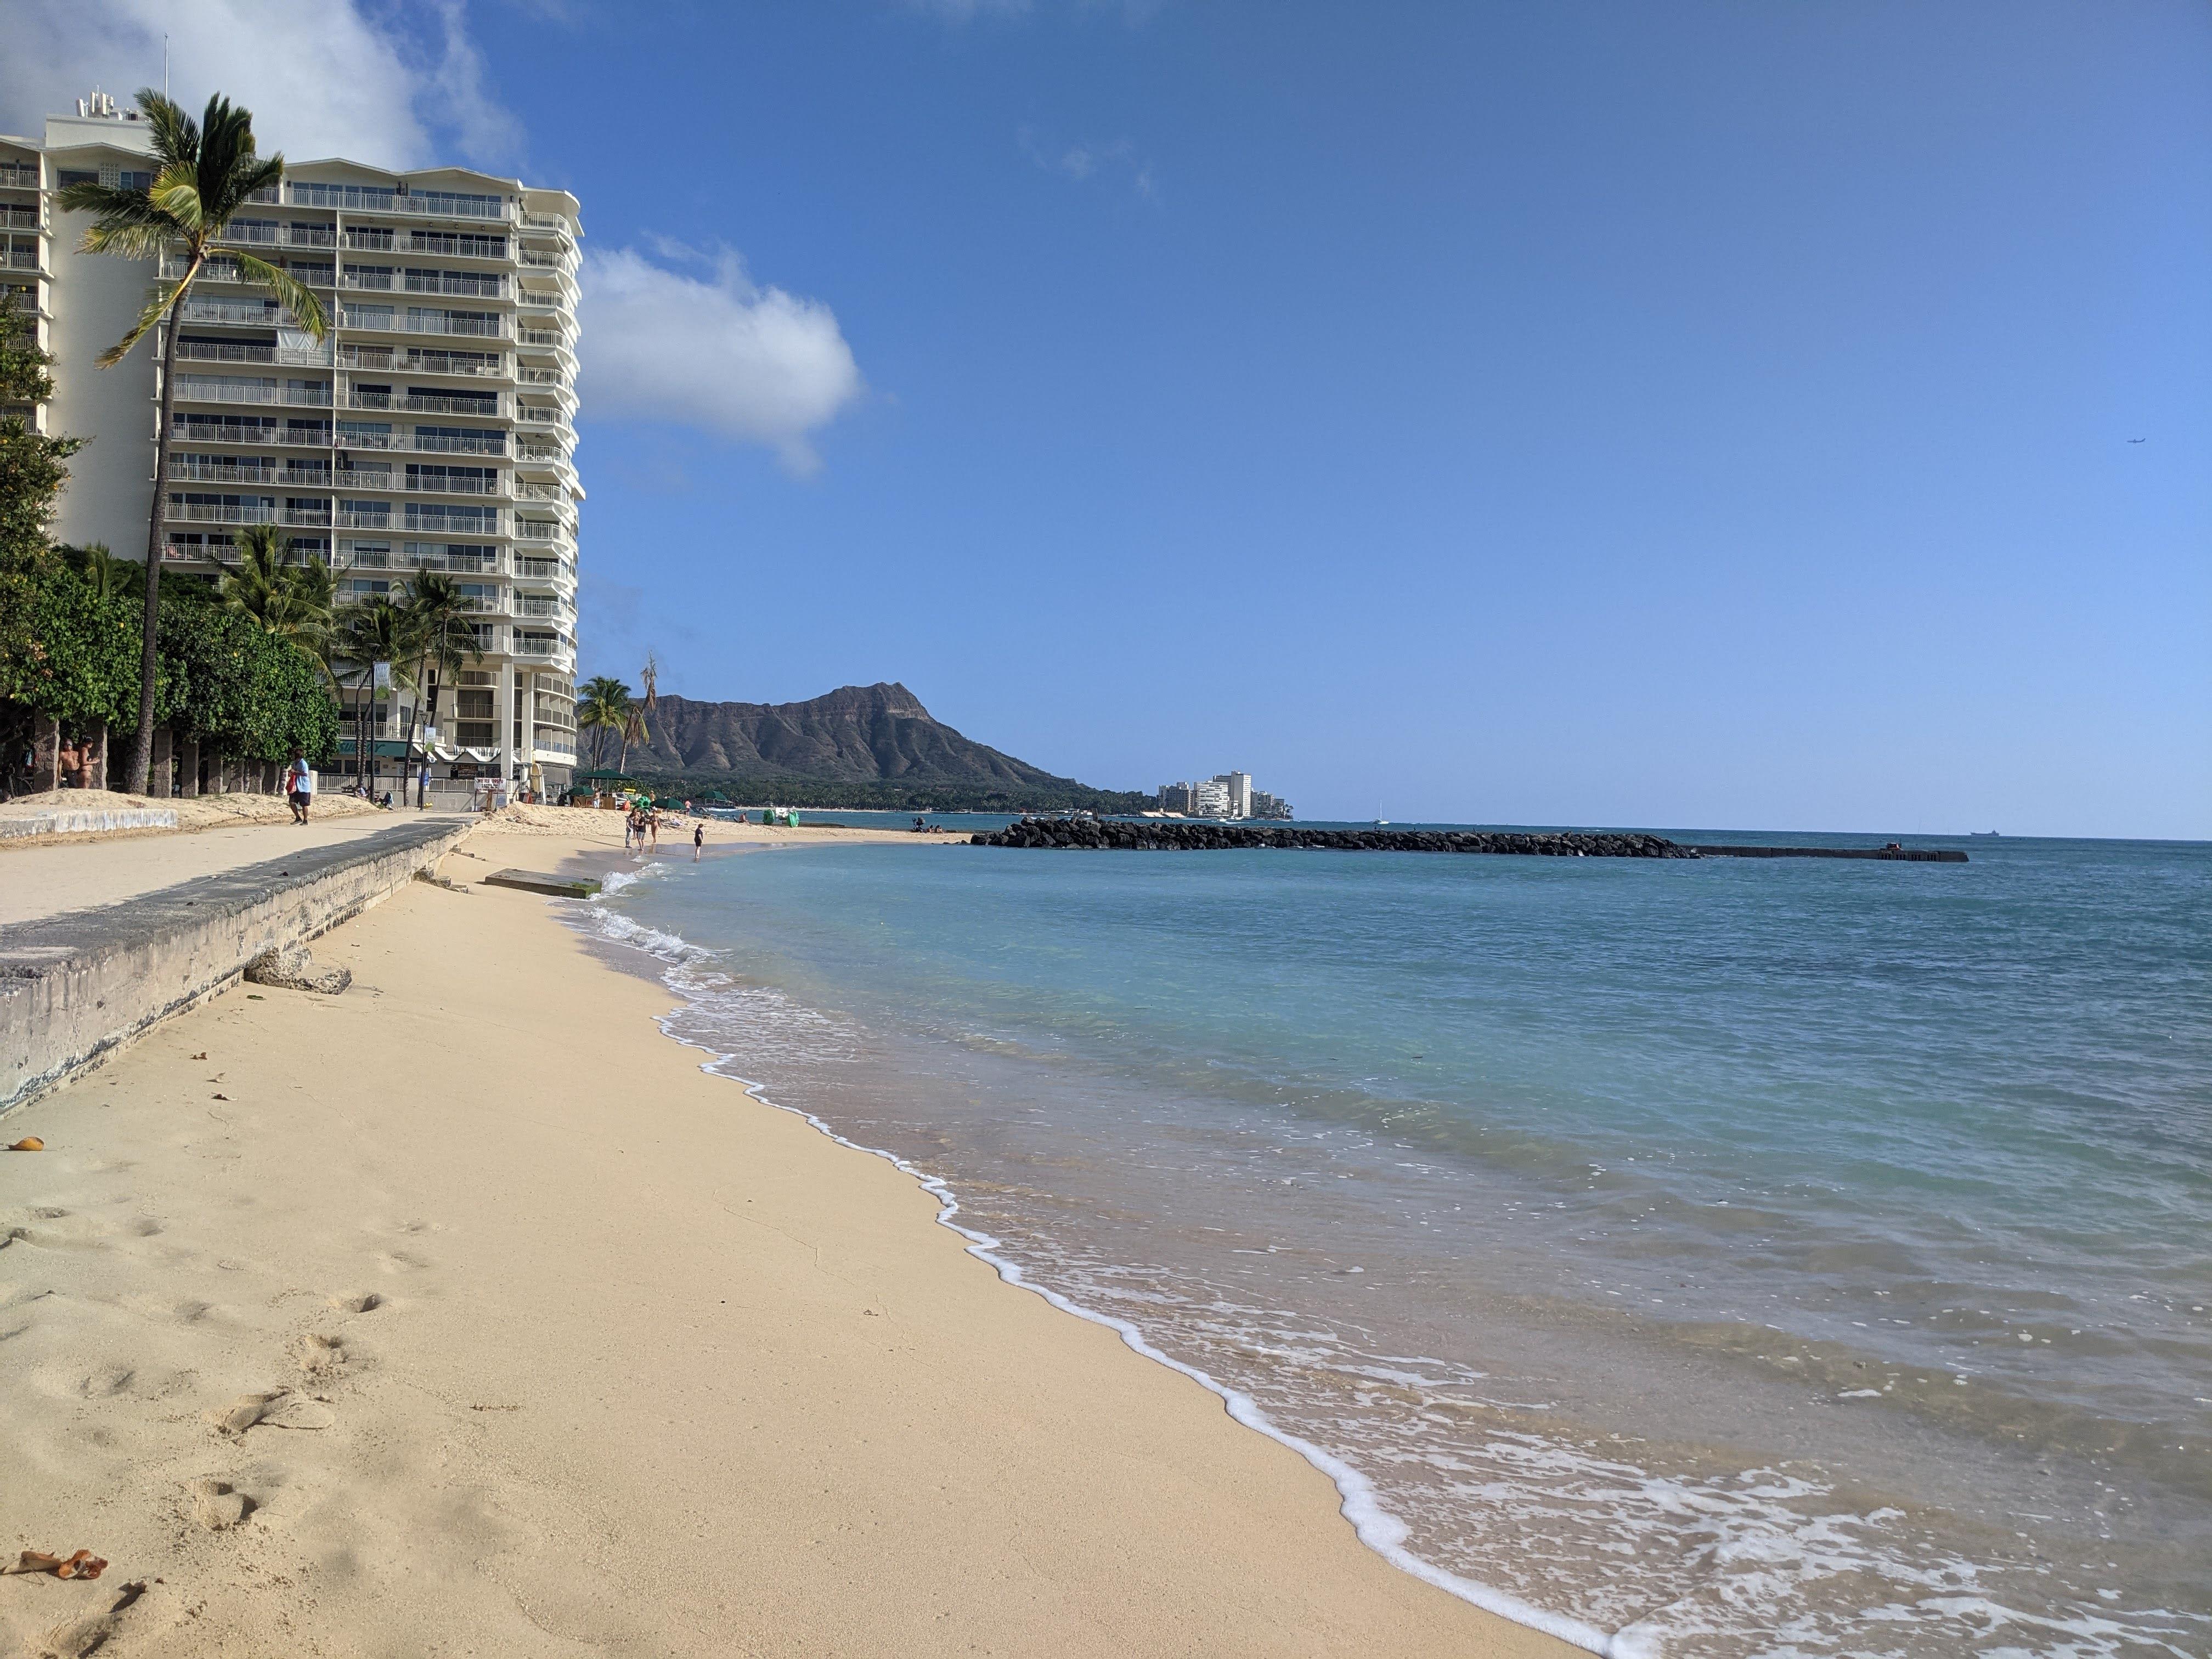 The beaches in Honolulu weren't crowded in January.